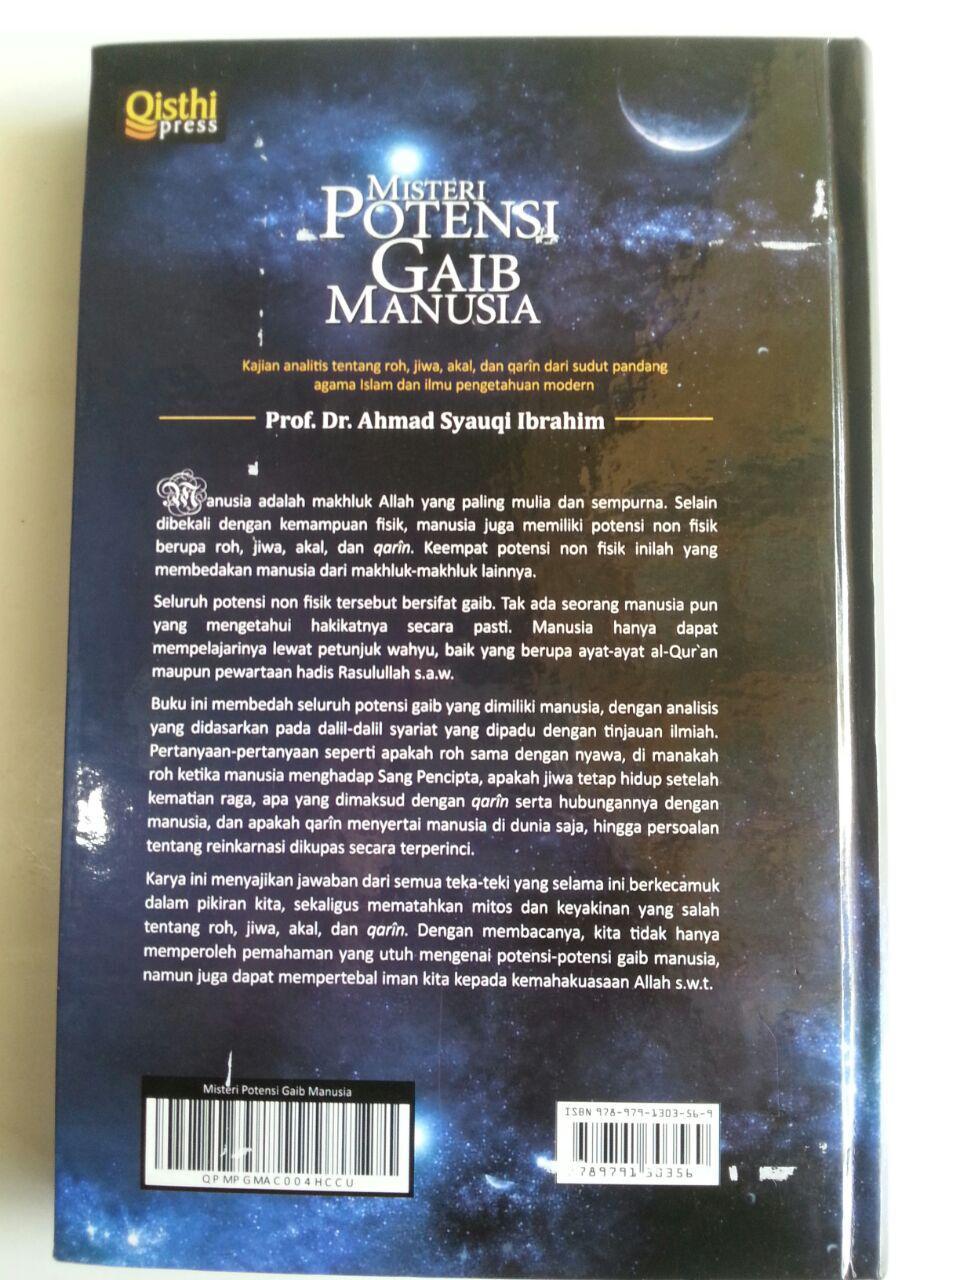 Buku Misteri Potensi Gaib Manusia Kajian Analitis Roh Jiwa Akal cover